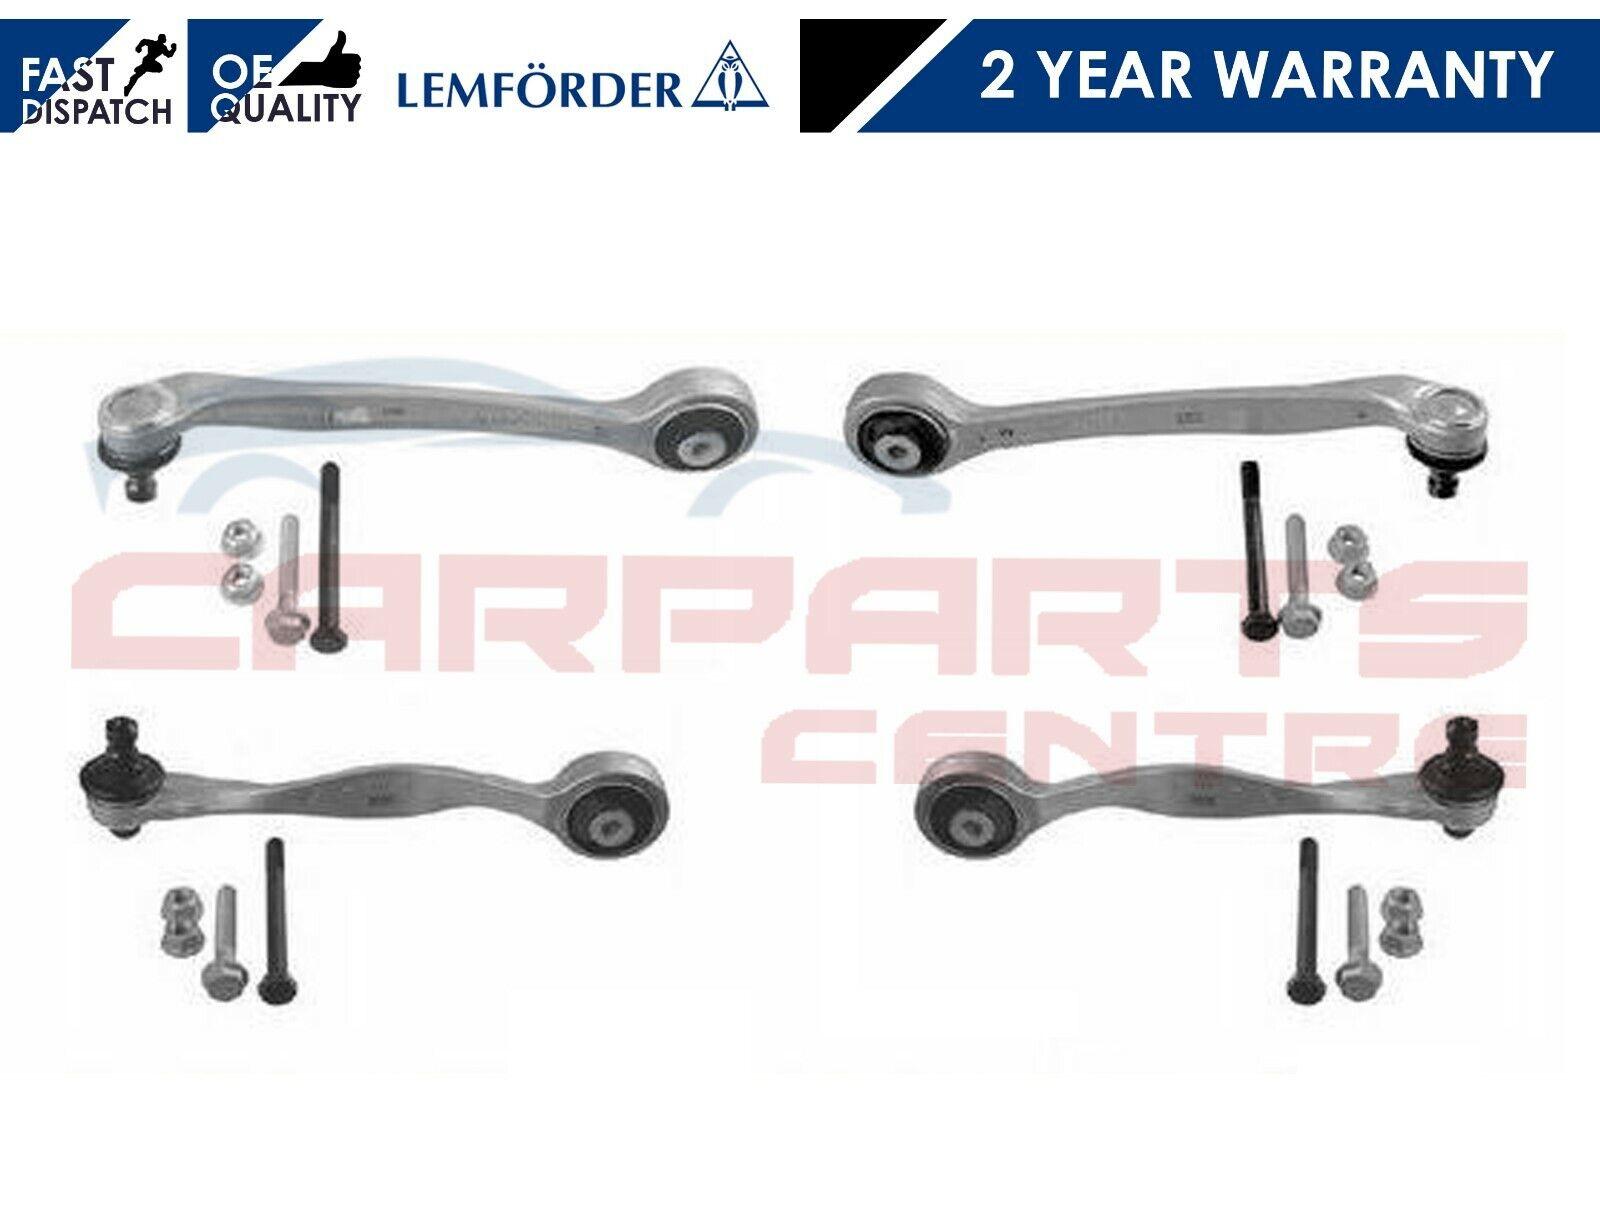 FRONT UPPER RIGHT TRACK CONTROL ARM FOR AUDI A4 VW PASSAT SUPERB 1.6 1.8 1.9 TDI